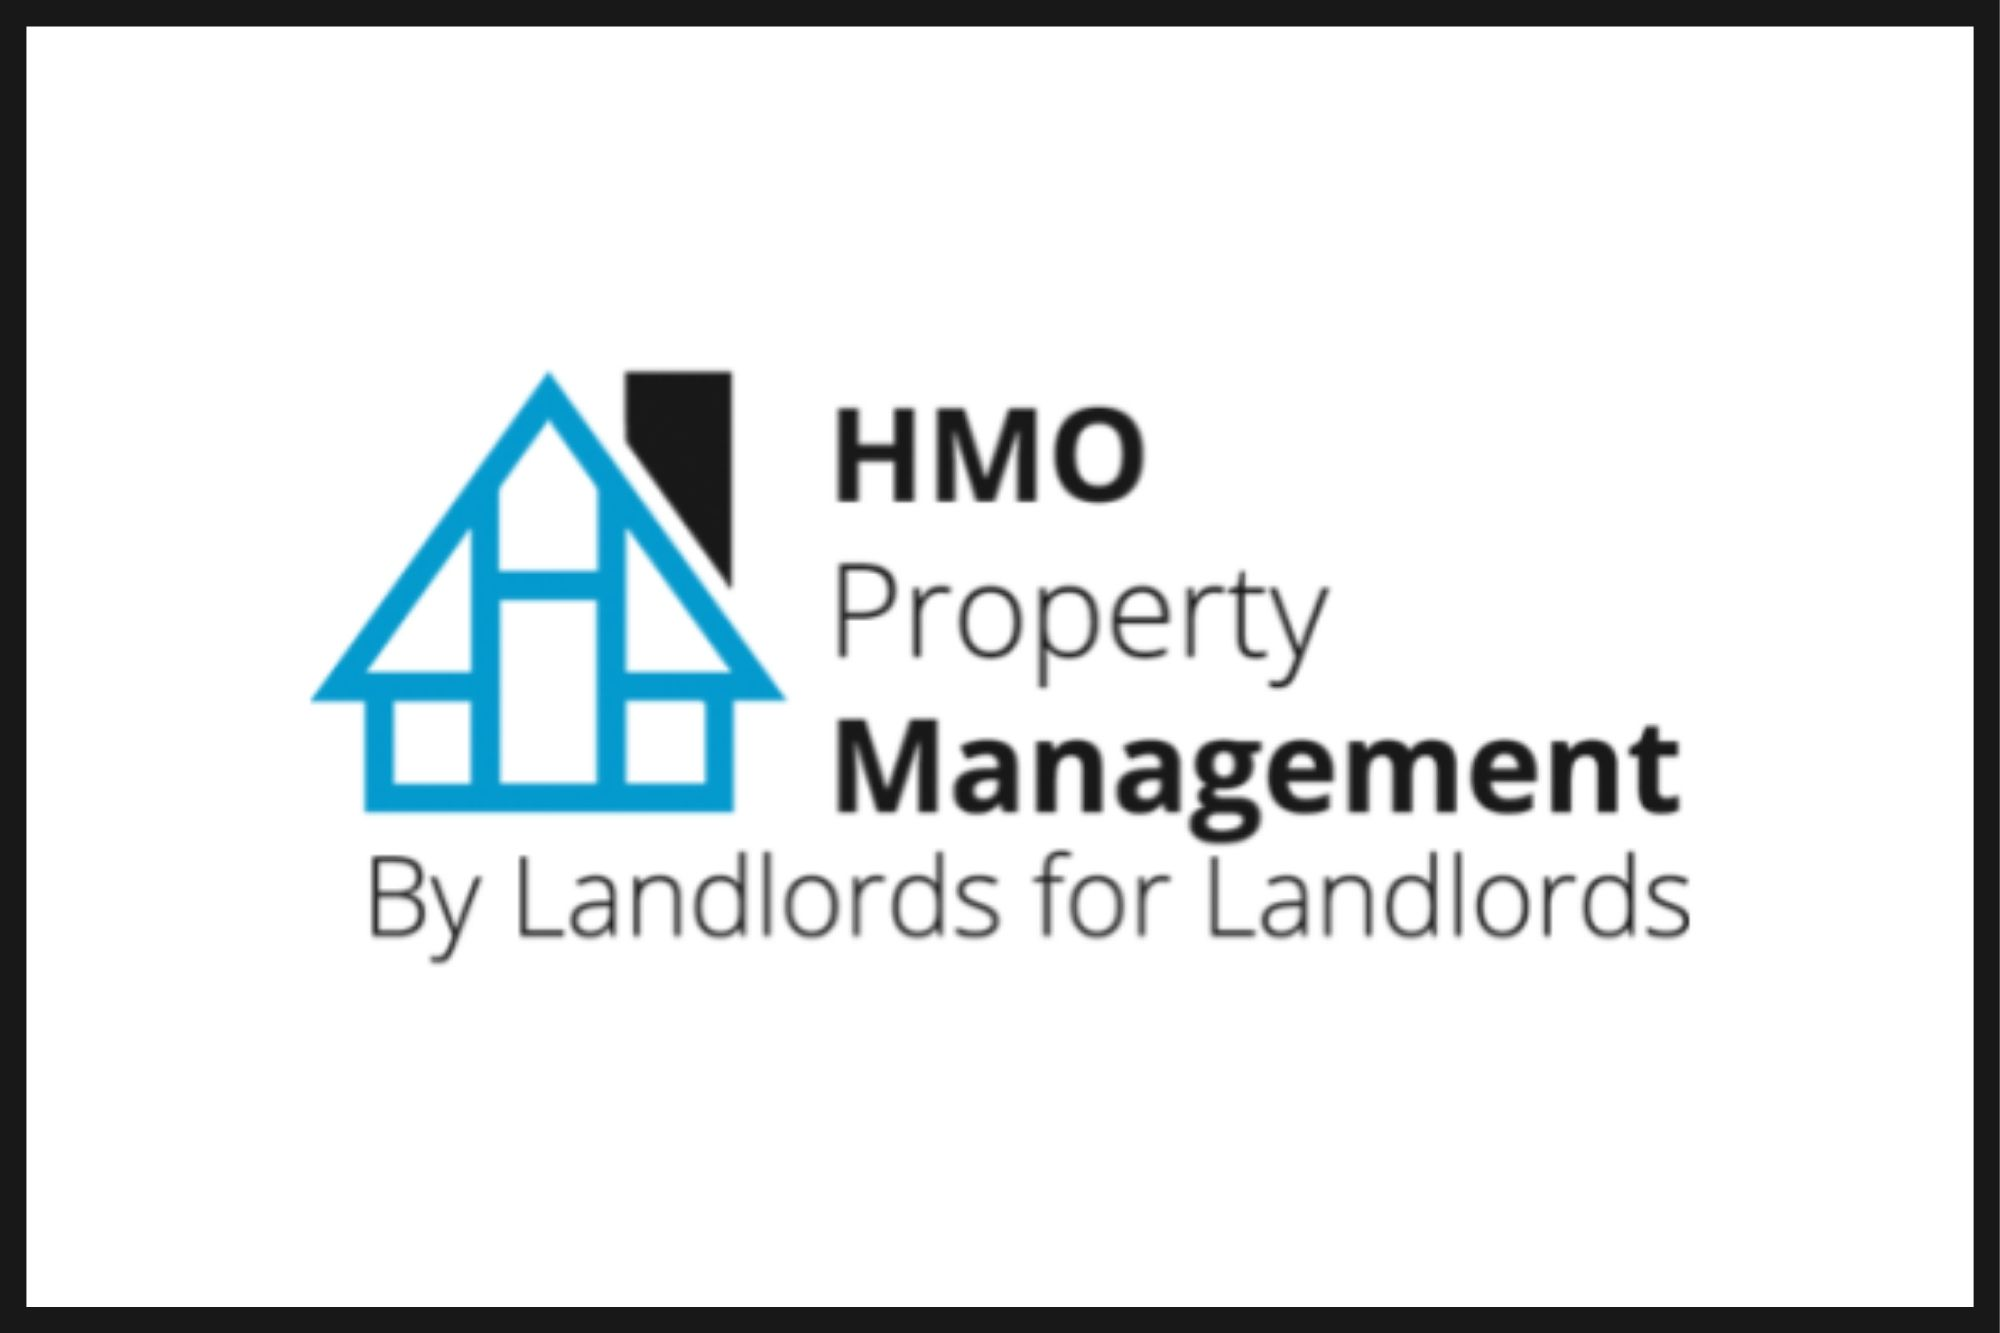 HMO Property Management